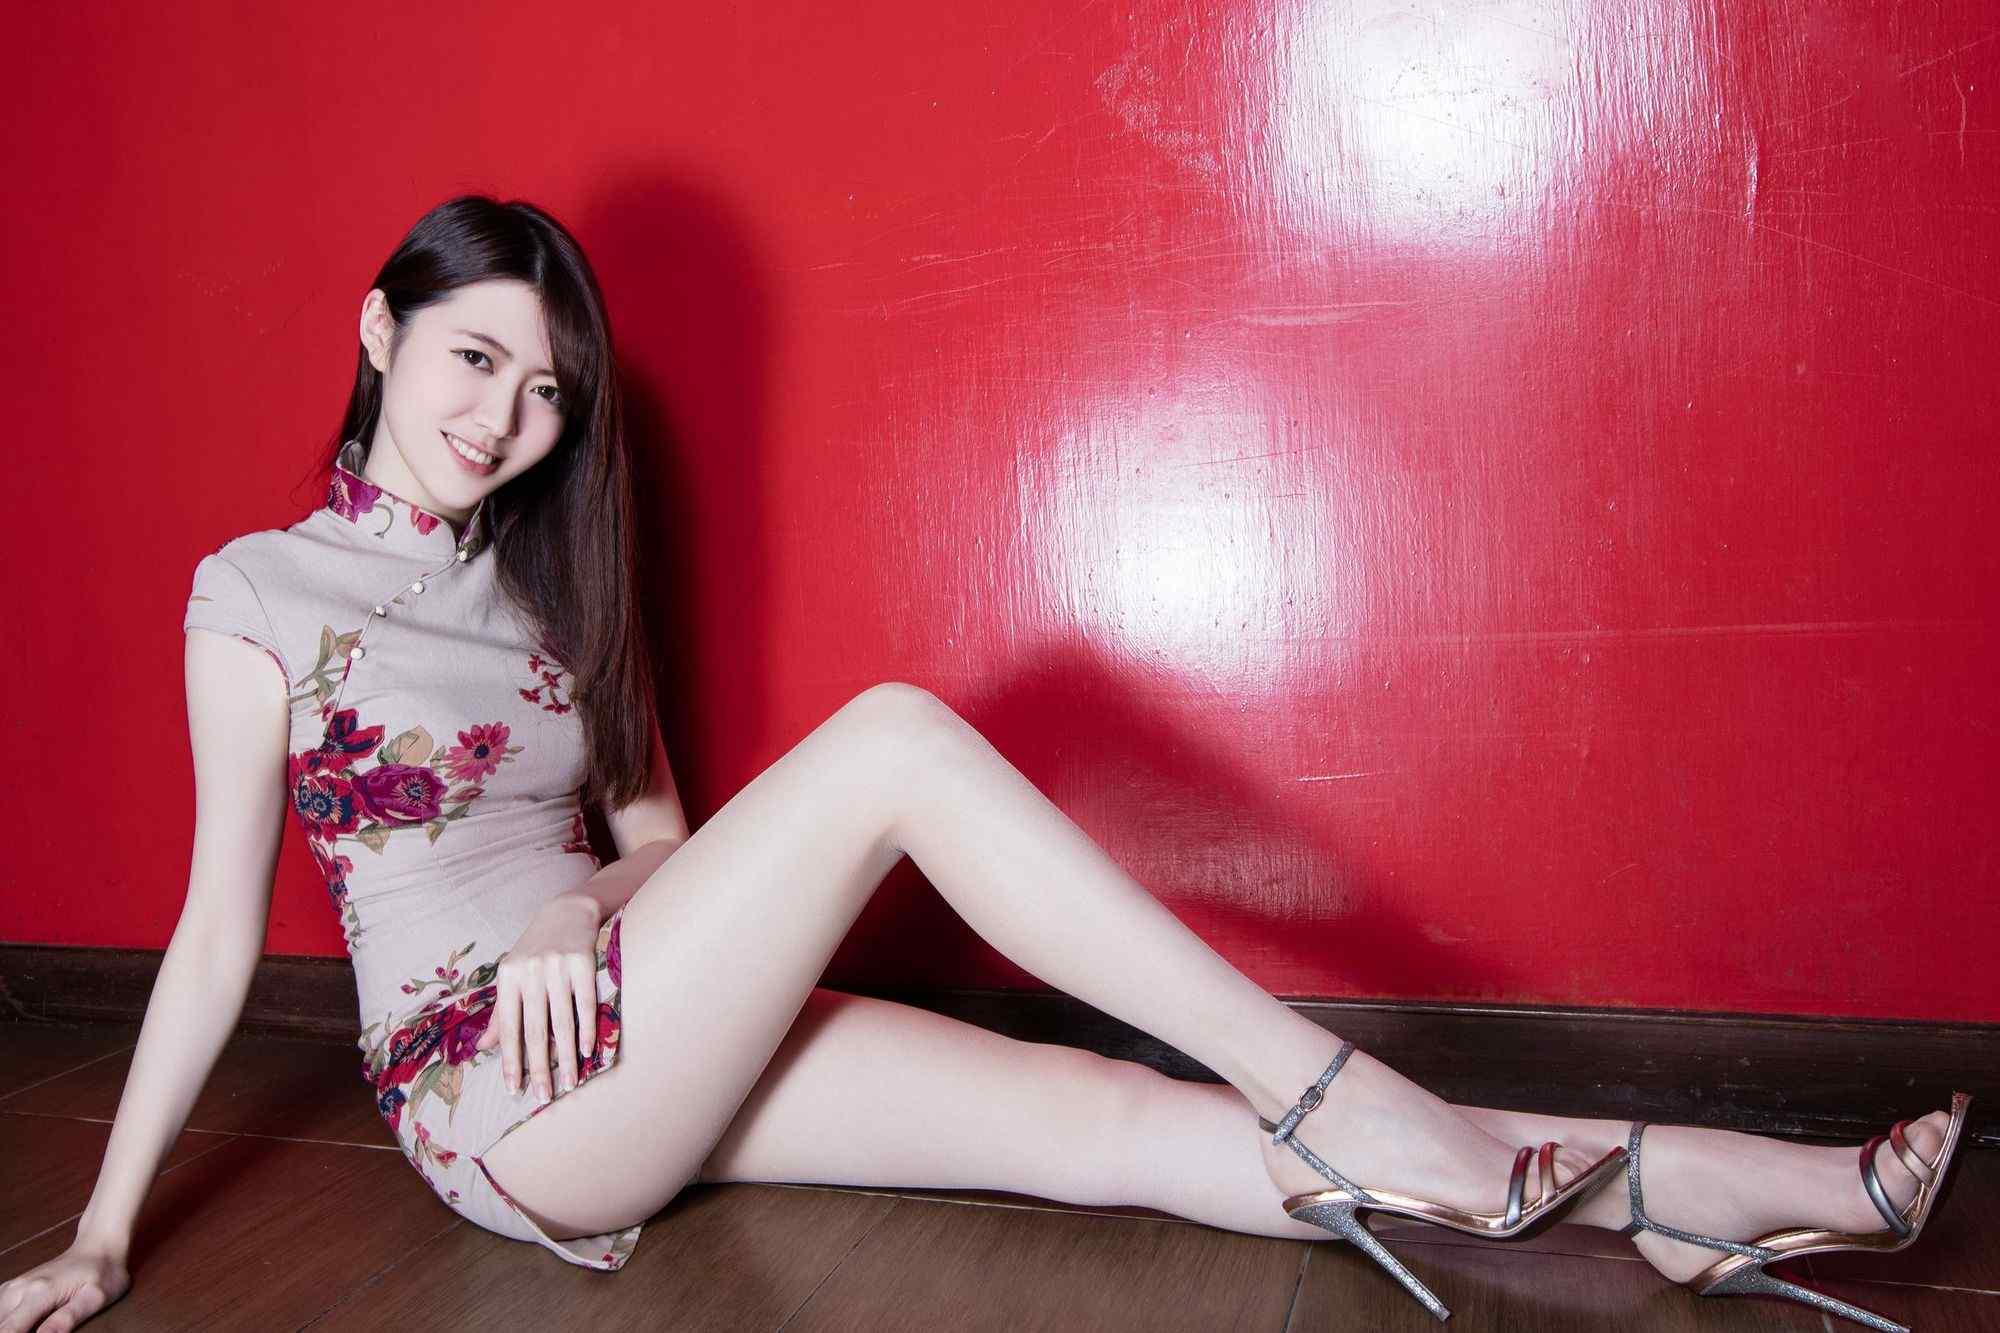 Beautyleg的肉丝旗袍美女性感写真图片桌面壁纸